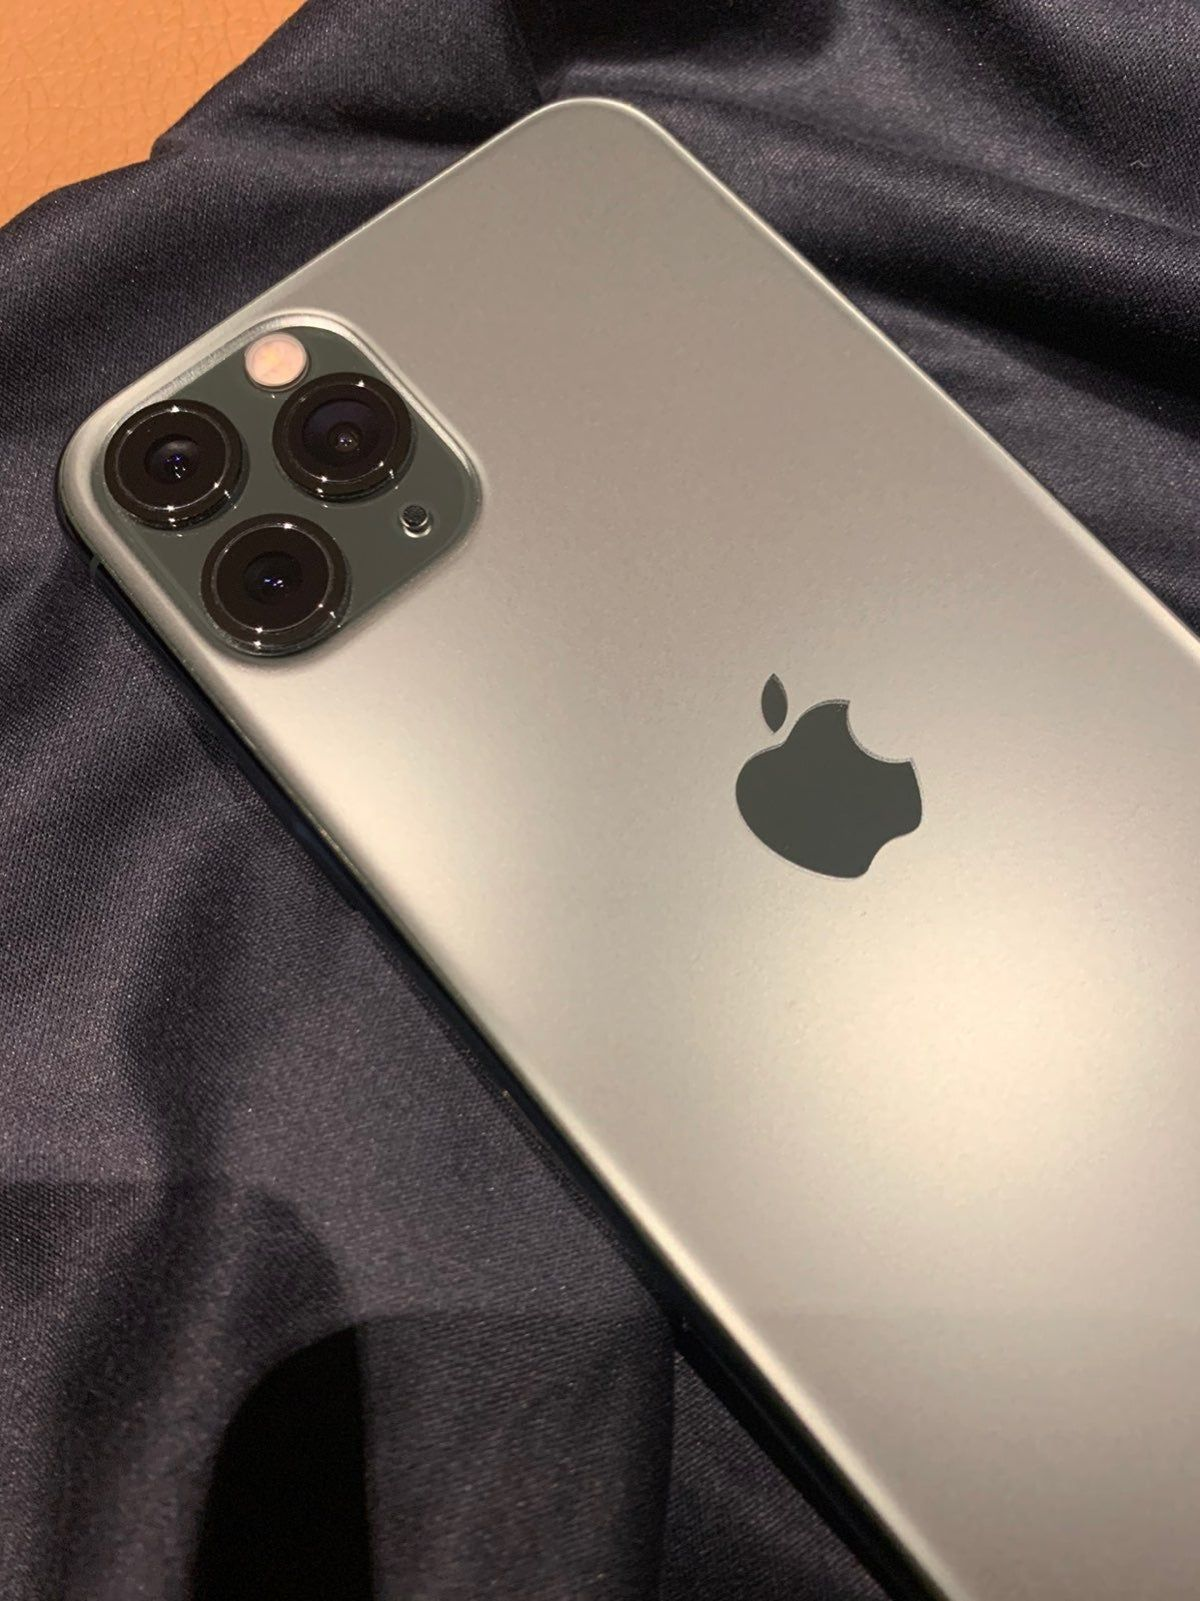 Iphone 11 Pro Midnight Green 256 Gb Veri Apple Iphone Accessories Iphone Iphone 11 Pro Midnight Green